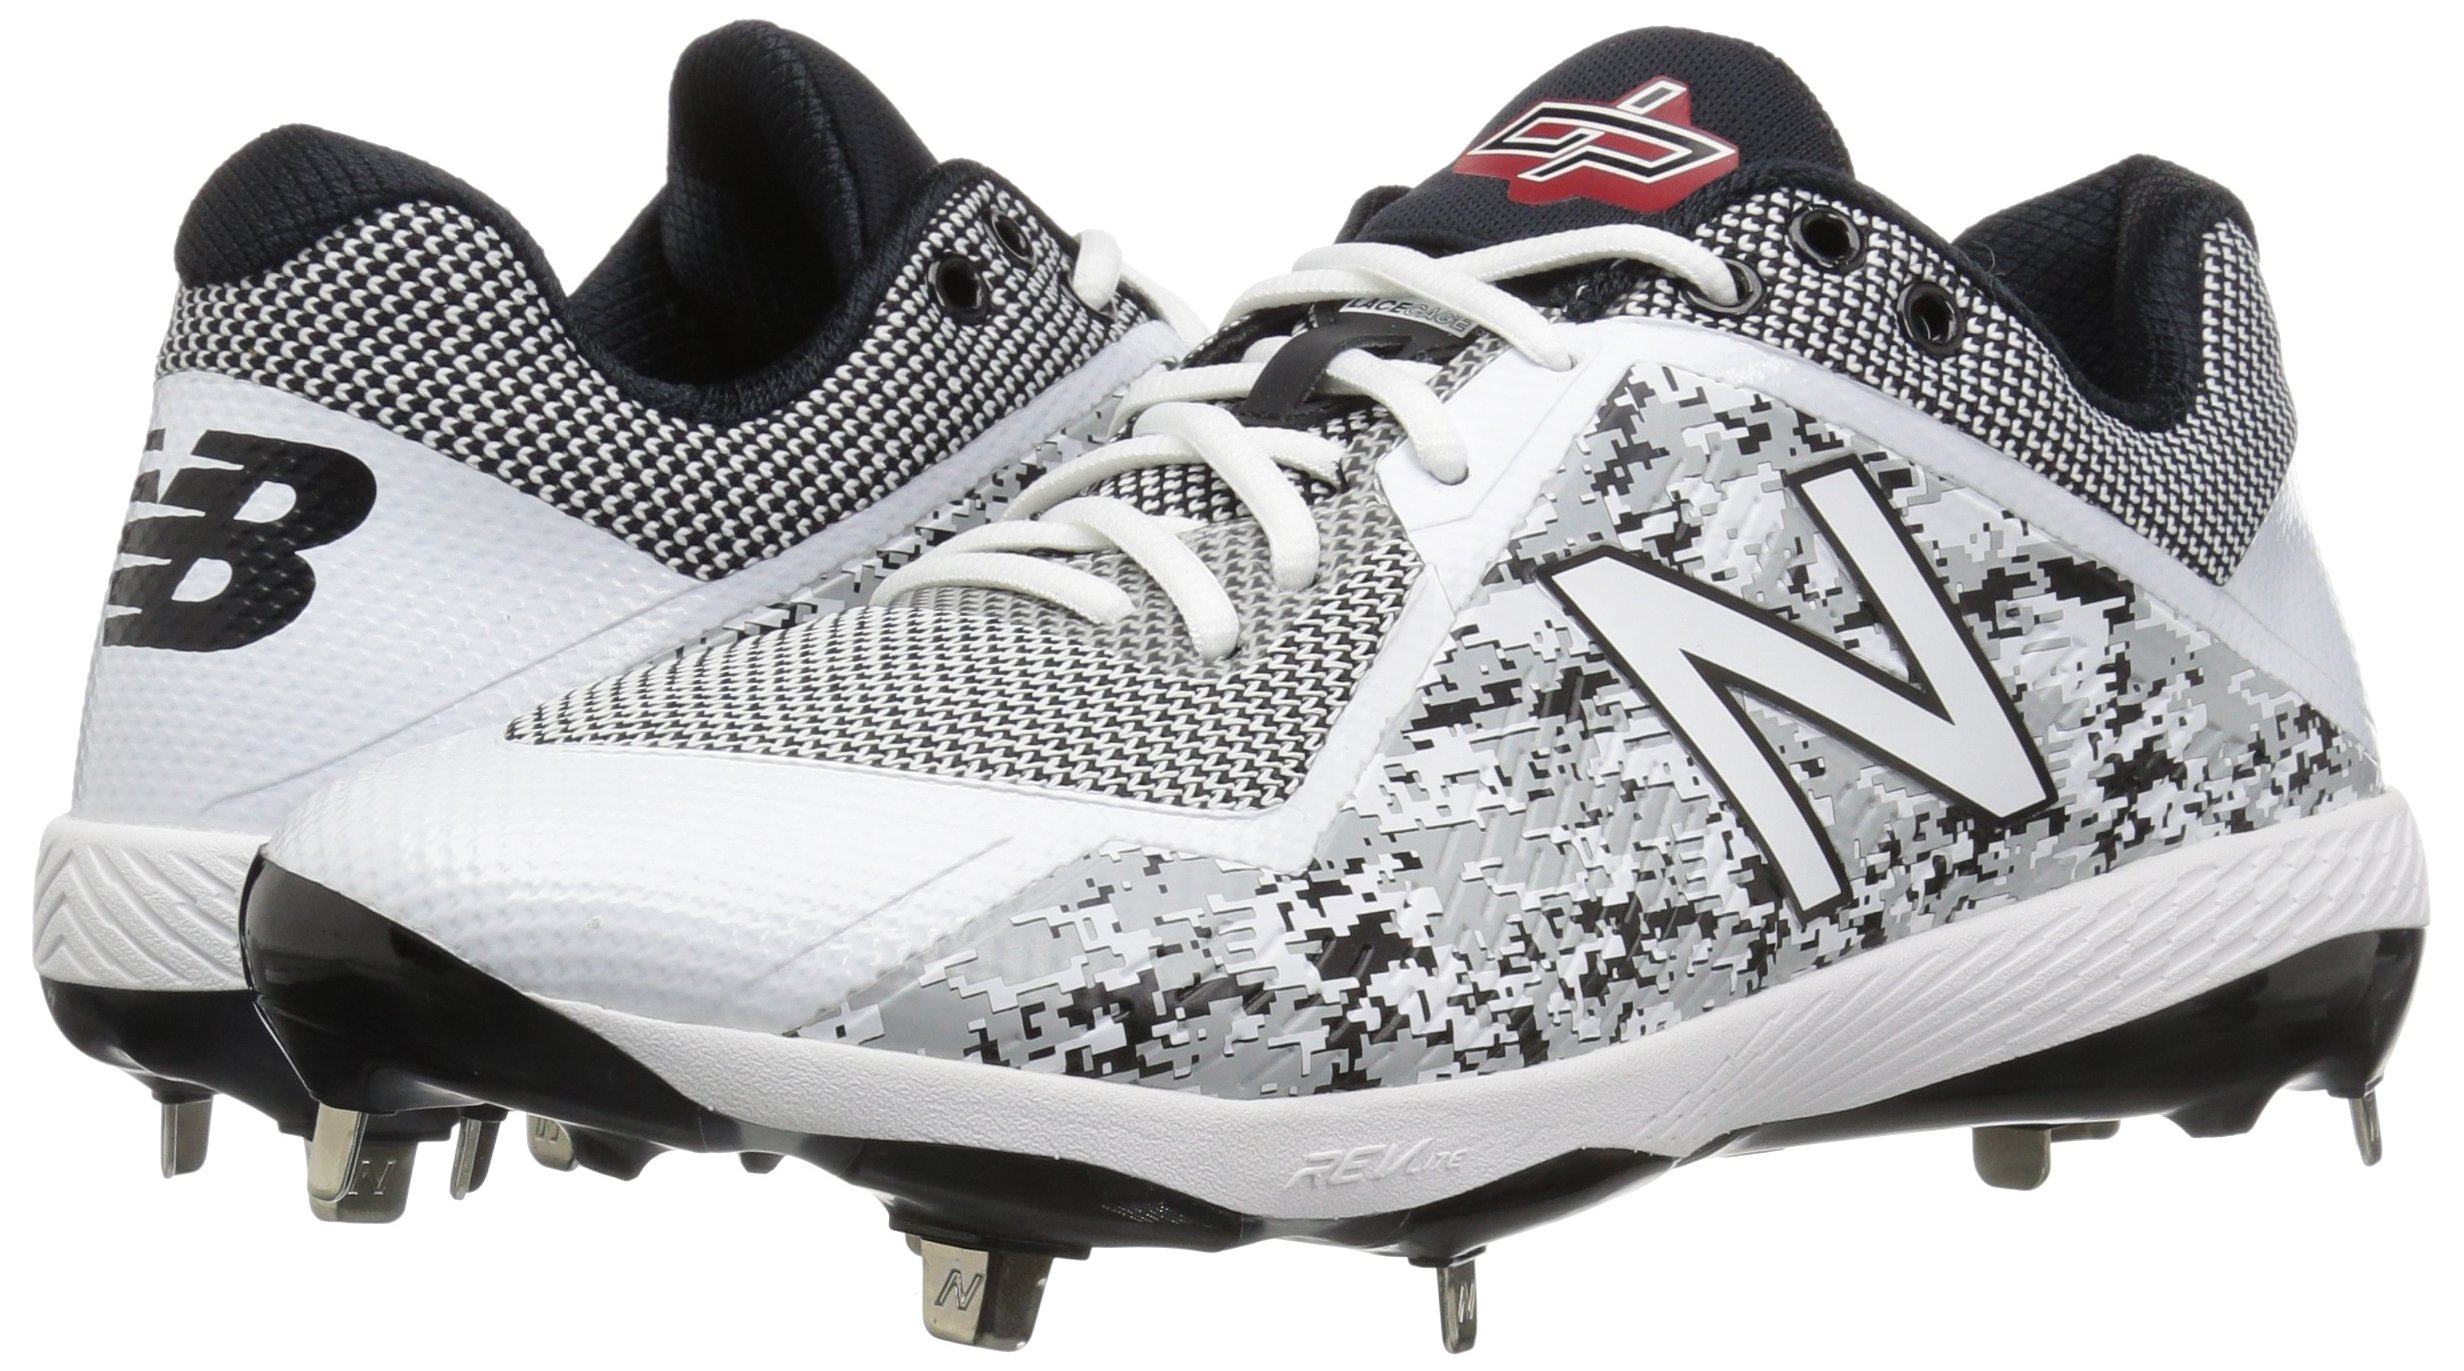 New Balance Men's L4040v4 Metal Baseball Shoe, Silver/Camo, 7.5 2E US by New Balance (Image #6)